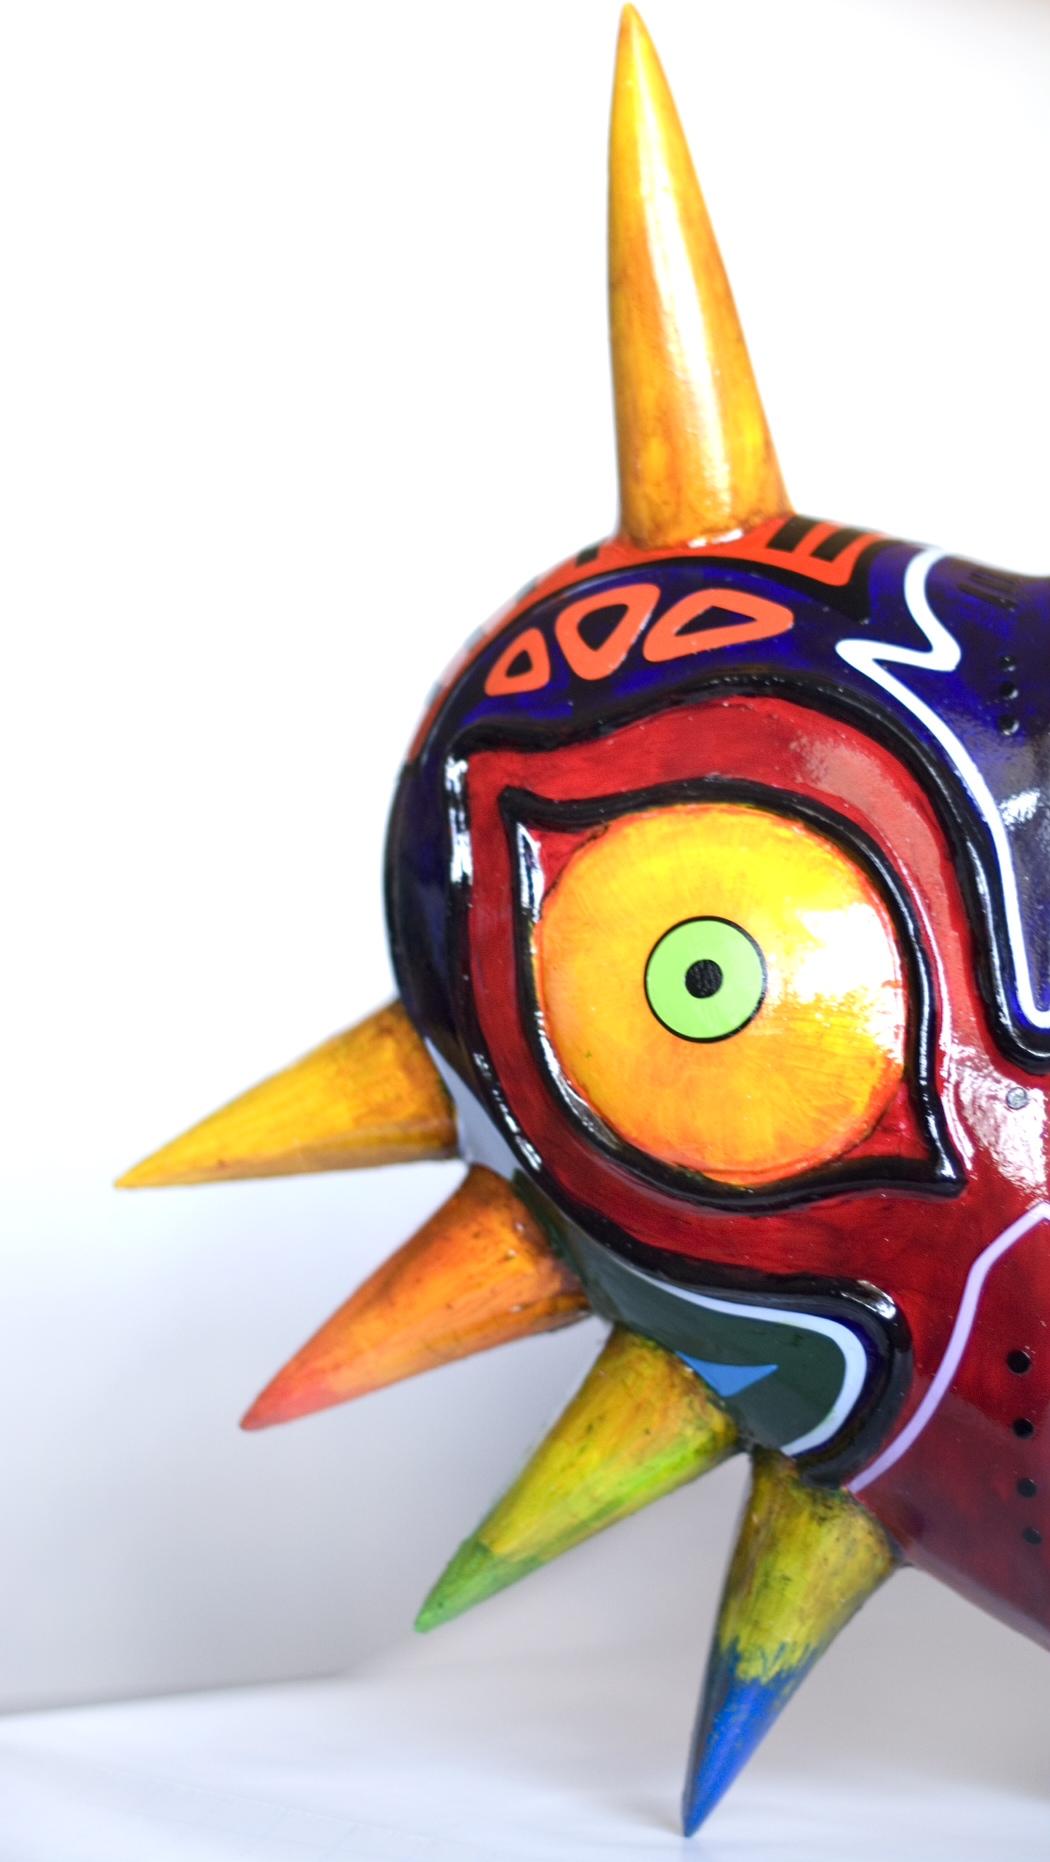 The Legend of Zelda: Majora's Mask Replica